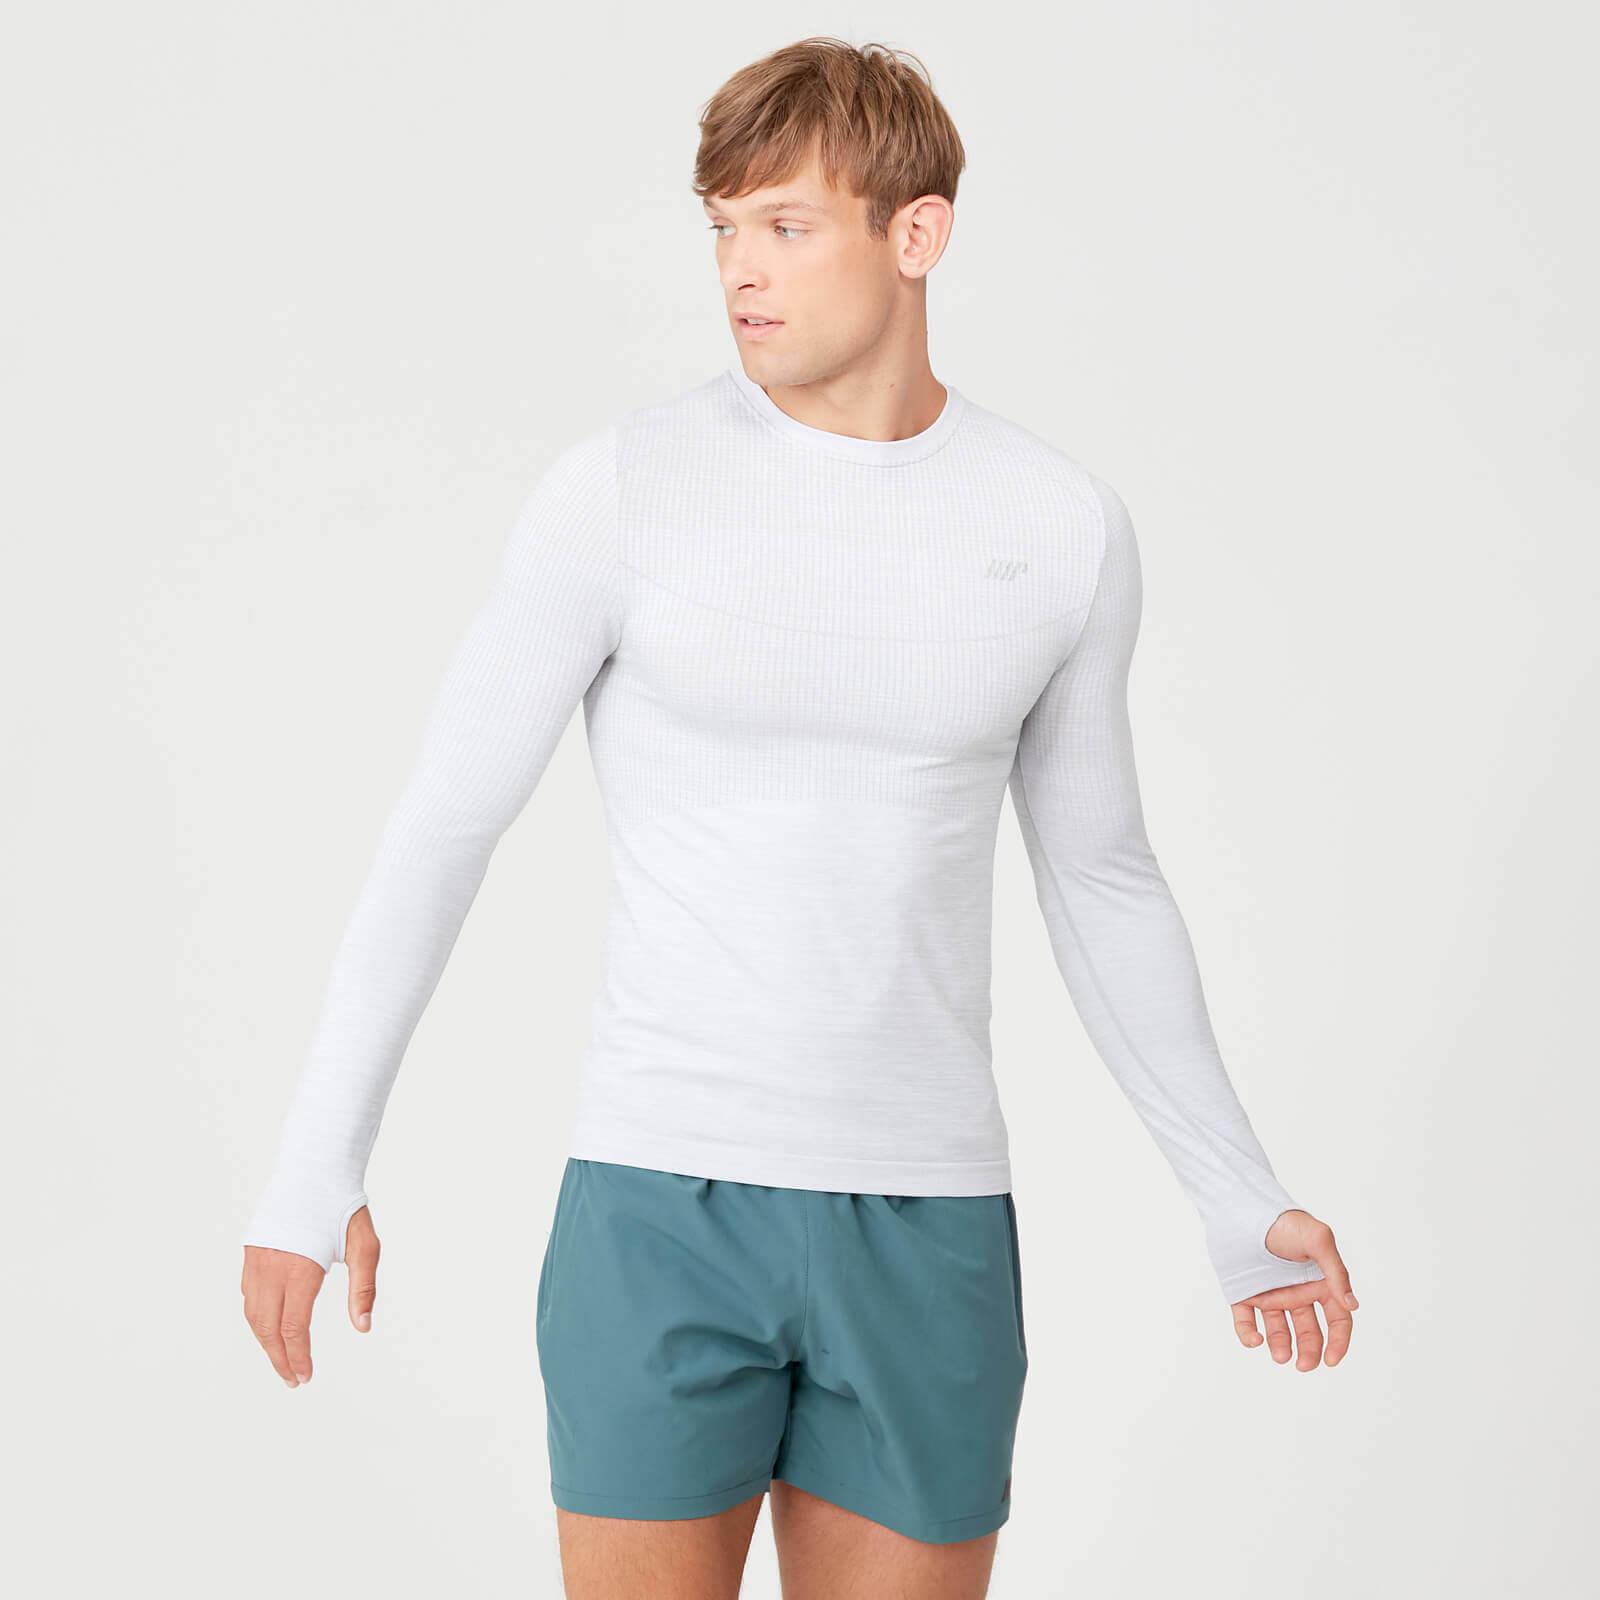 Myprotein Seamless Long Sleeve T-Shirt - Silver - XXL